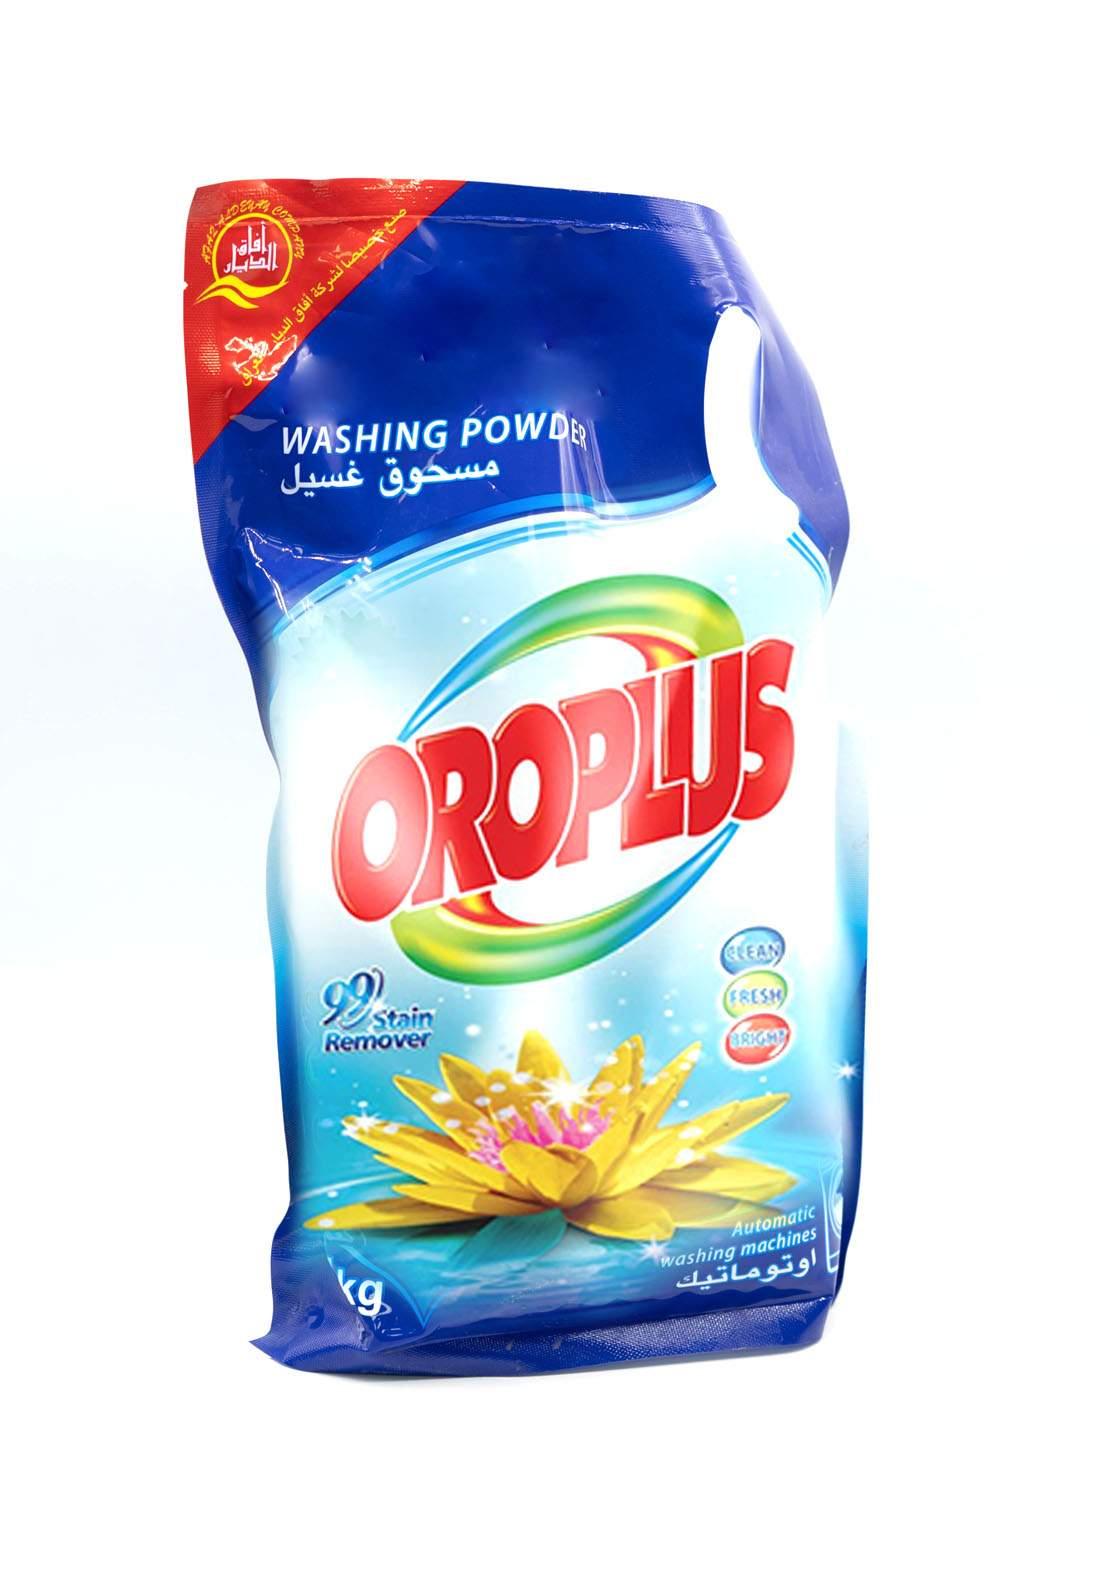 Oroplus Washing Powder Stain Remover 1 Kg مسحوق غسيل